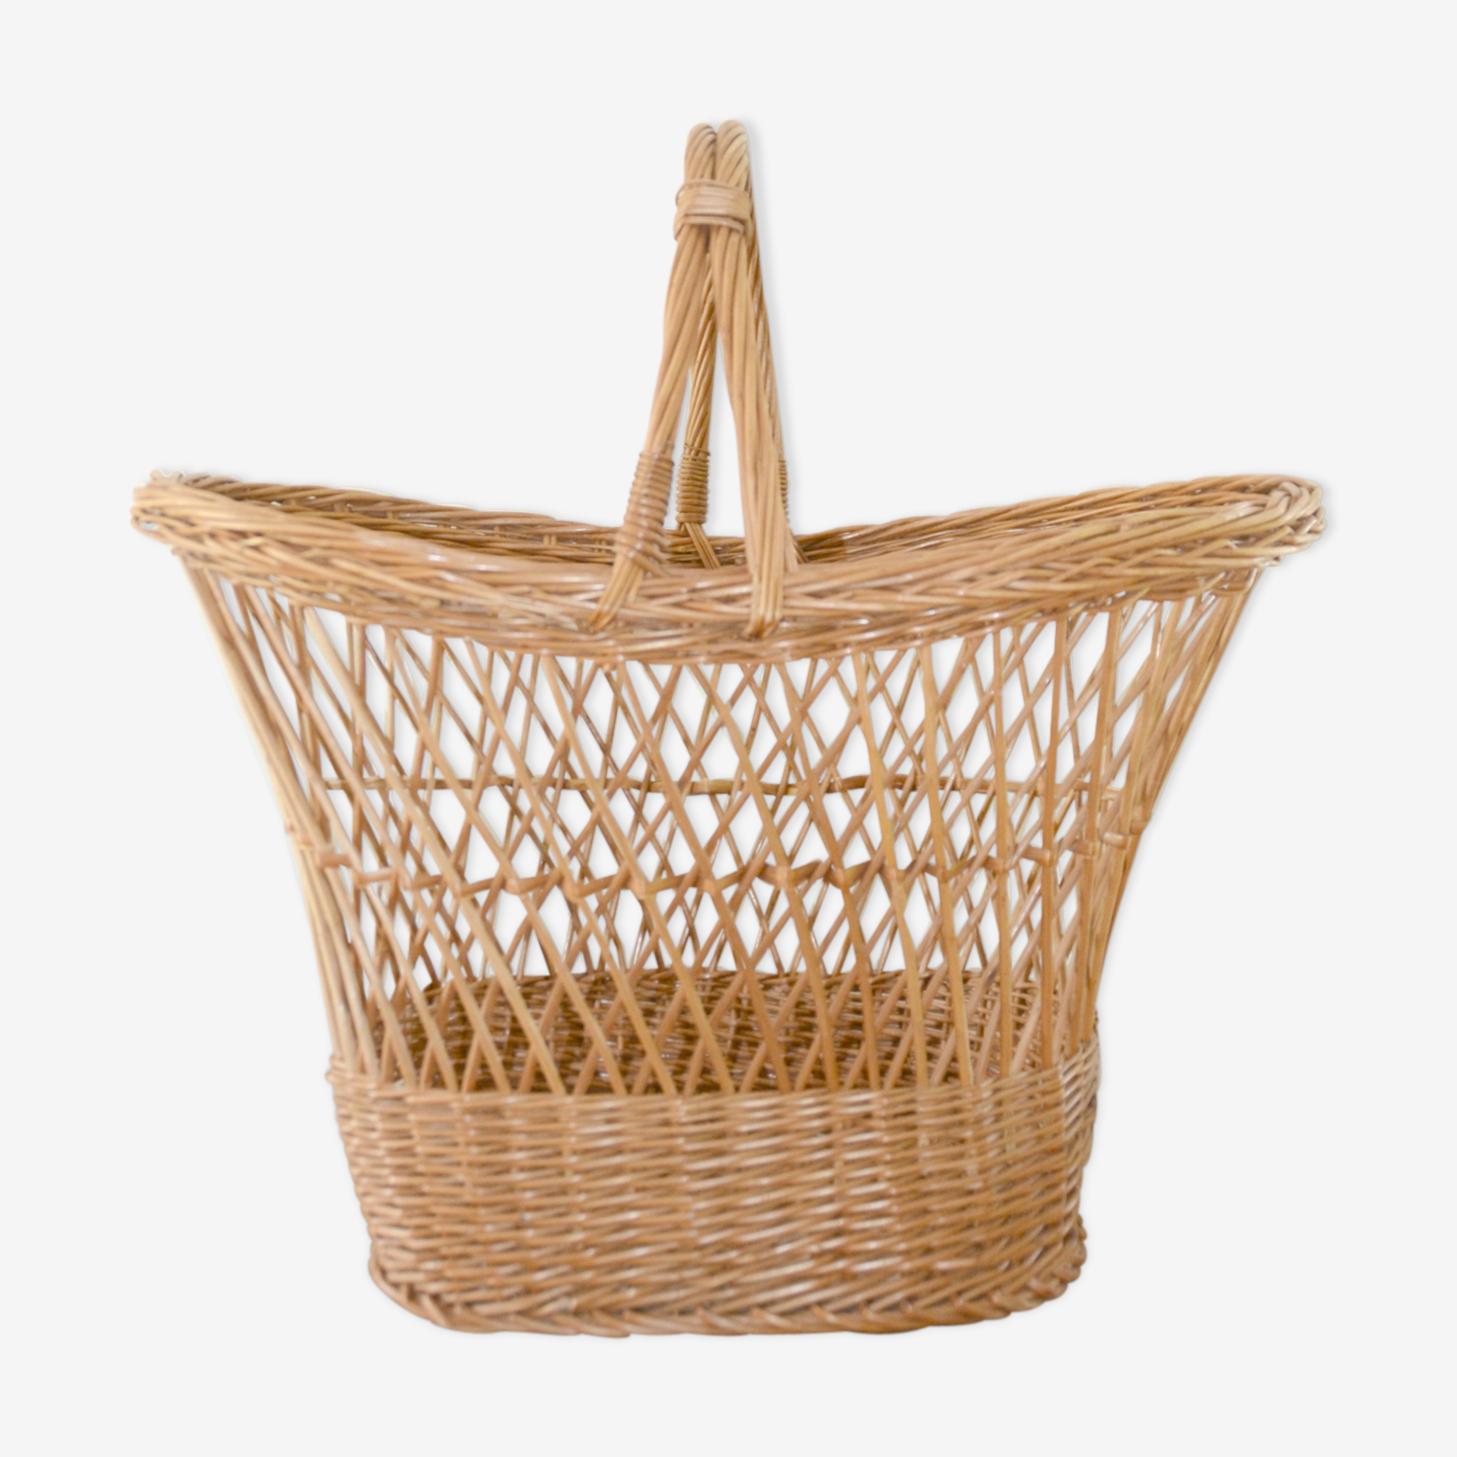 Market rattan and wicker basket